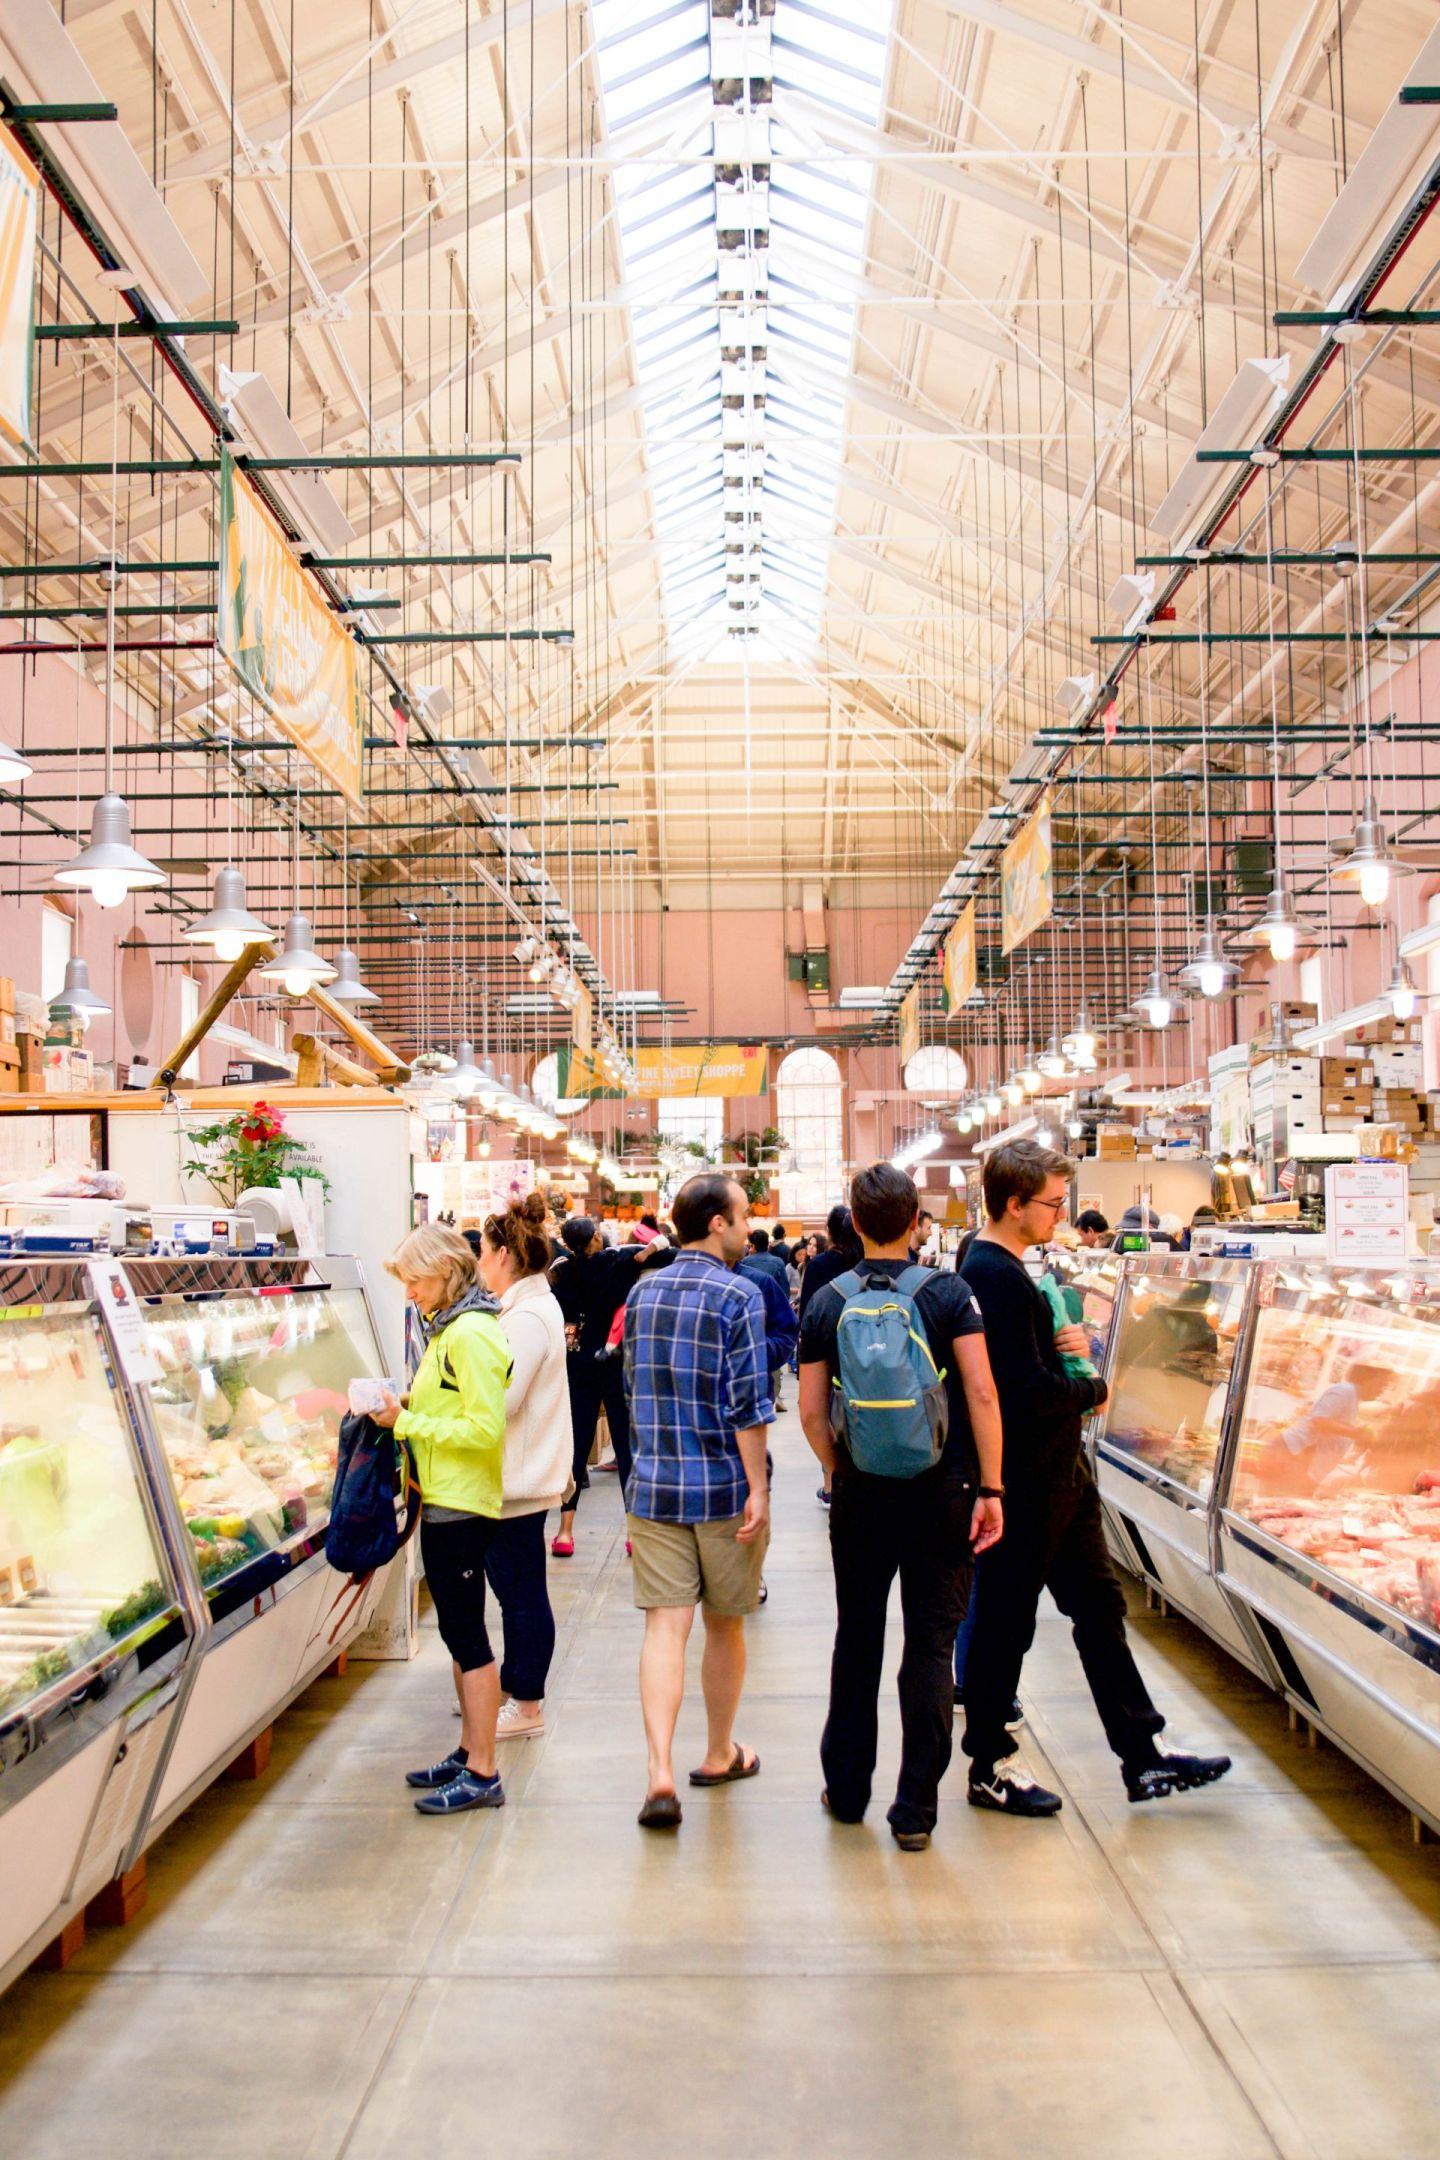 eastern market dc - eastern market guide - dc market